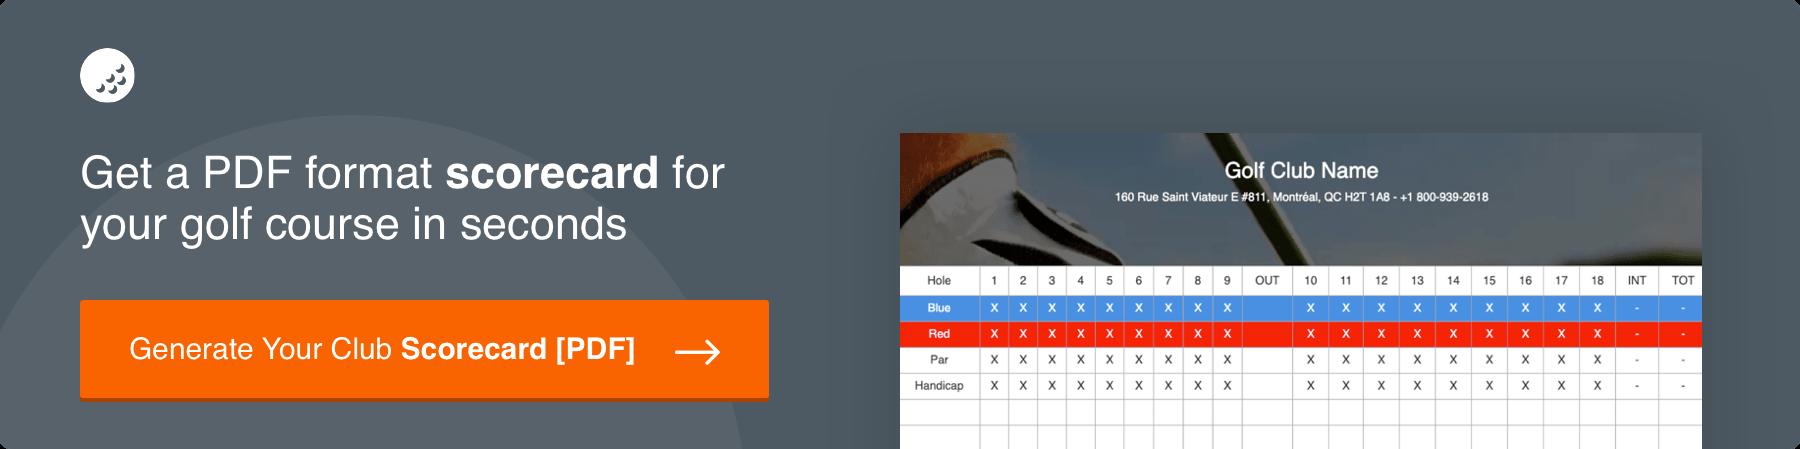 golf-scorecard-generator